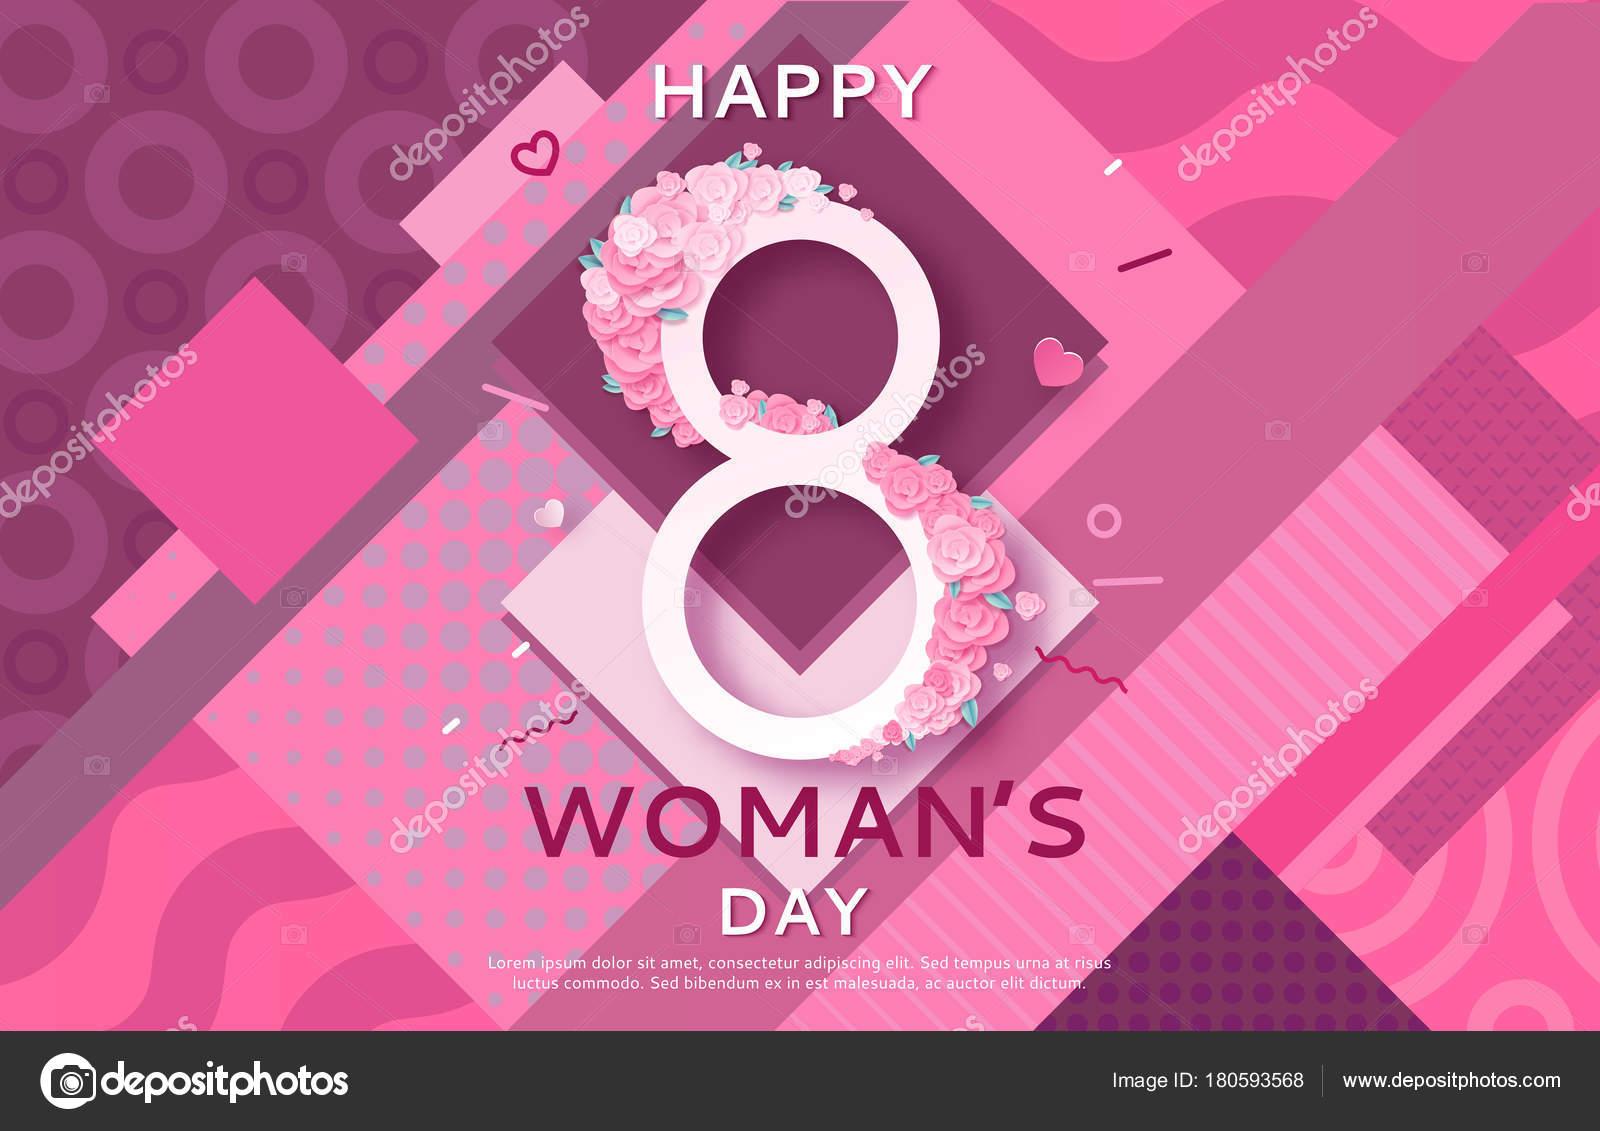 8 Art Elements : Geometric women s day banner march poster in modern